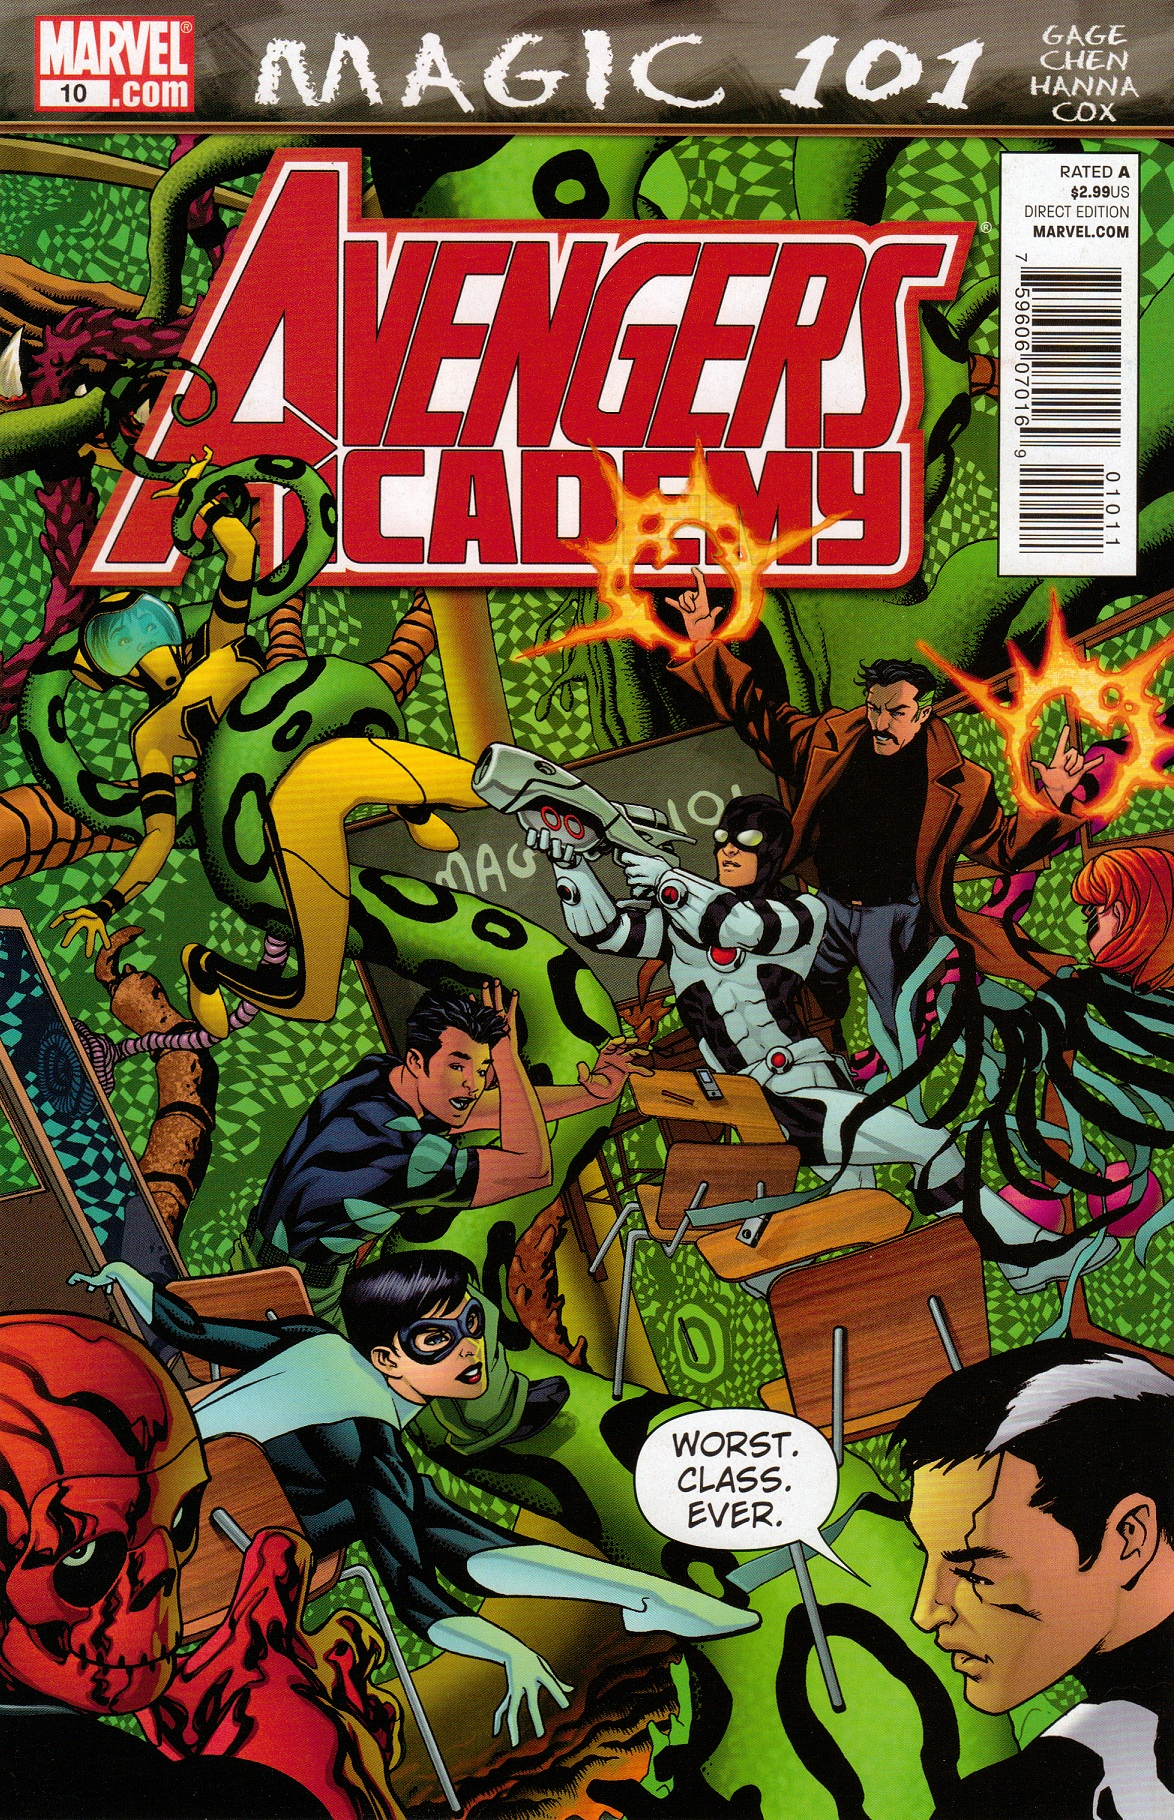 Avengers Academy Vol 1 10